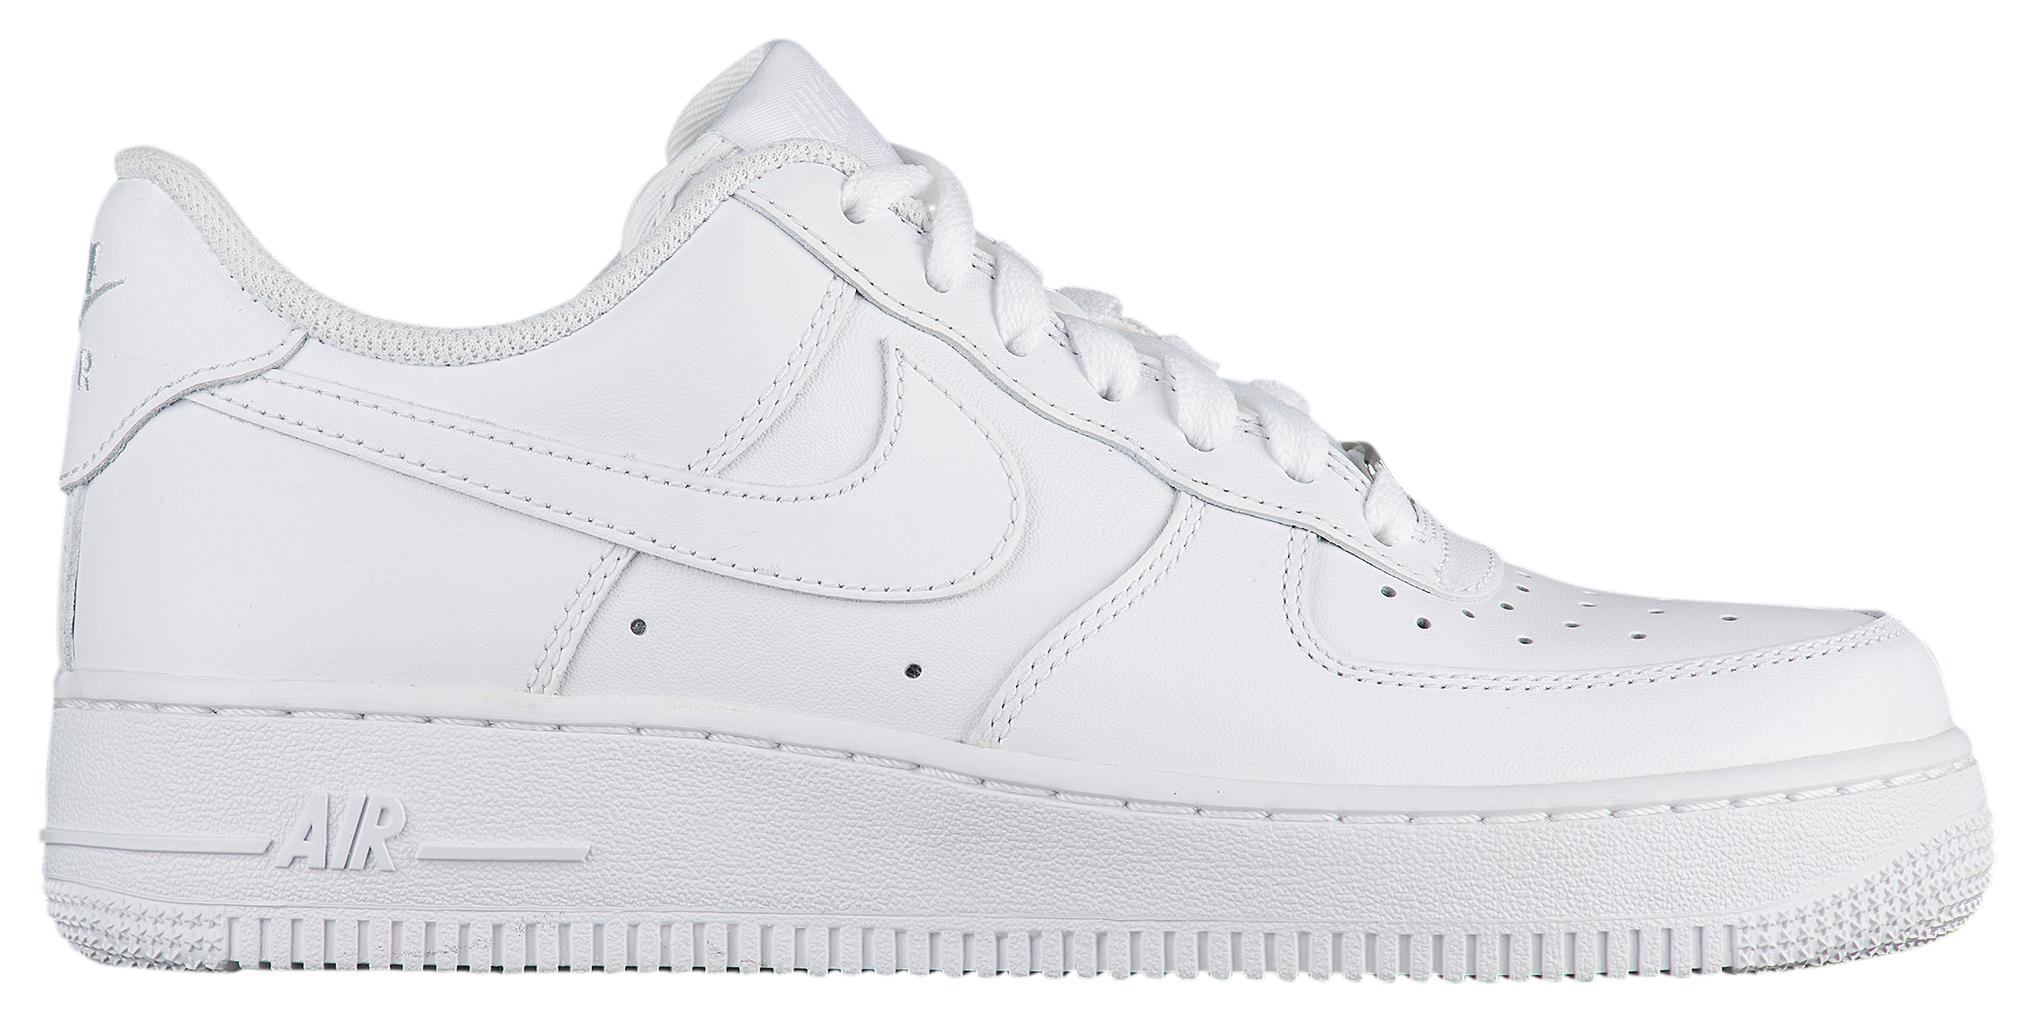 womens nike air force 1 white. Womens Nike Air Force 1 White 8